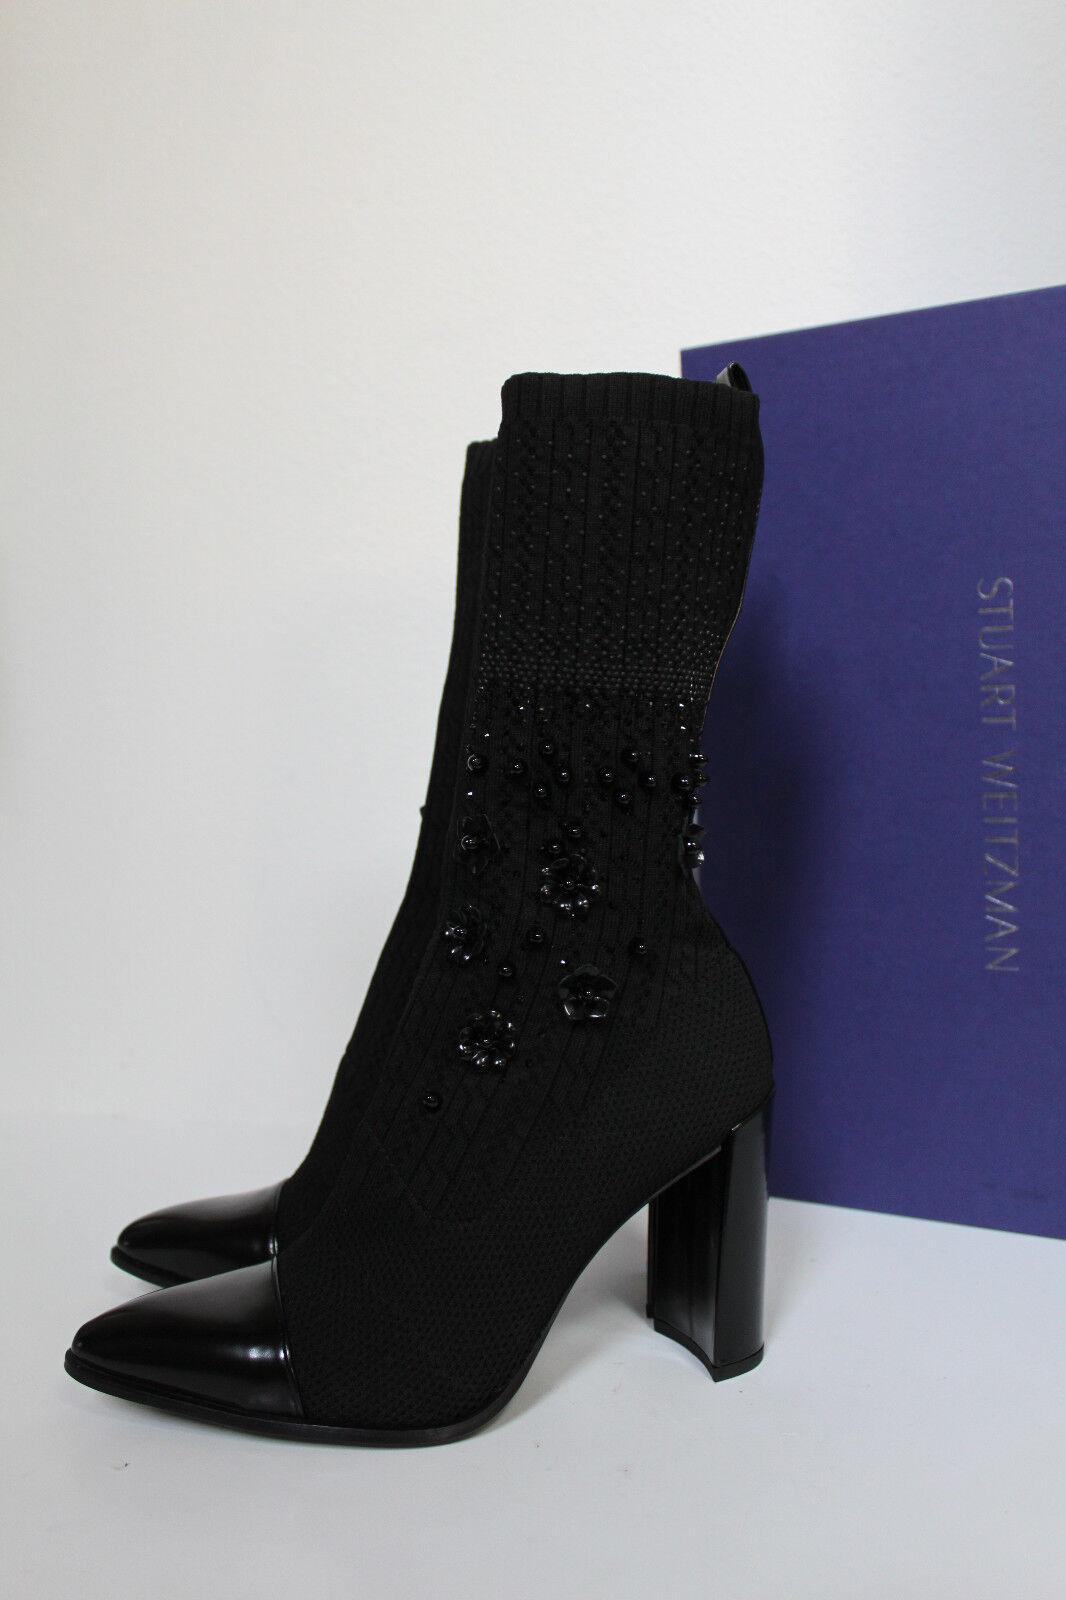 New sz 9 Stuart Mid-Calf Weitzman Sockhop Knit Glove Mid-Calf Stuart Pointed toe Bootie schuhes a0bec9